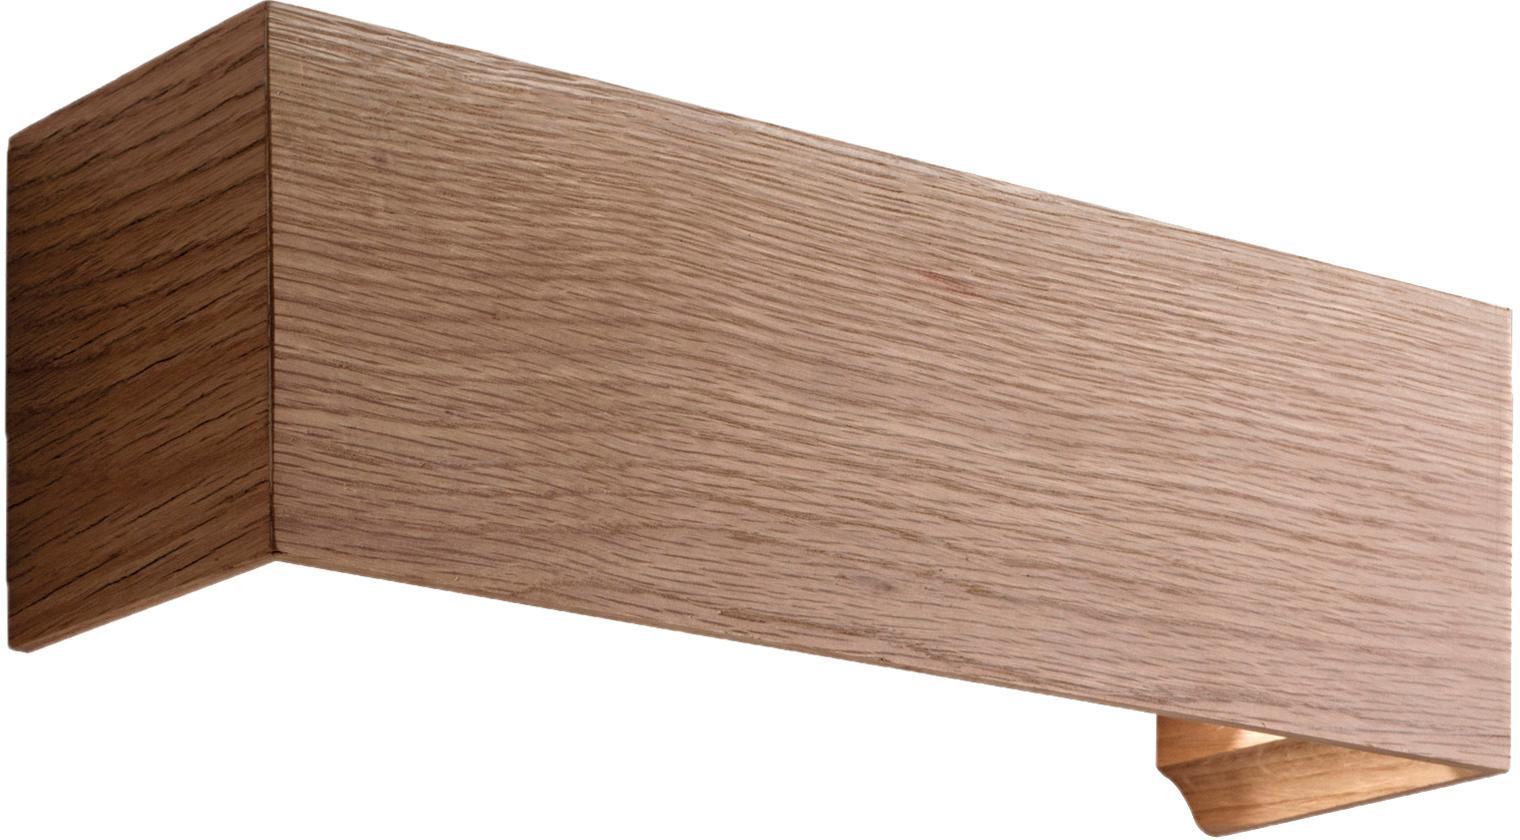 Applique Badia, Legno di quercia, Larg. 38 x Alt. 12 cm